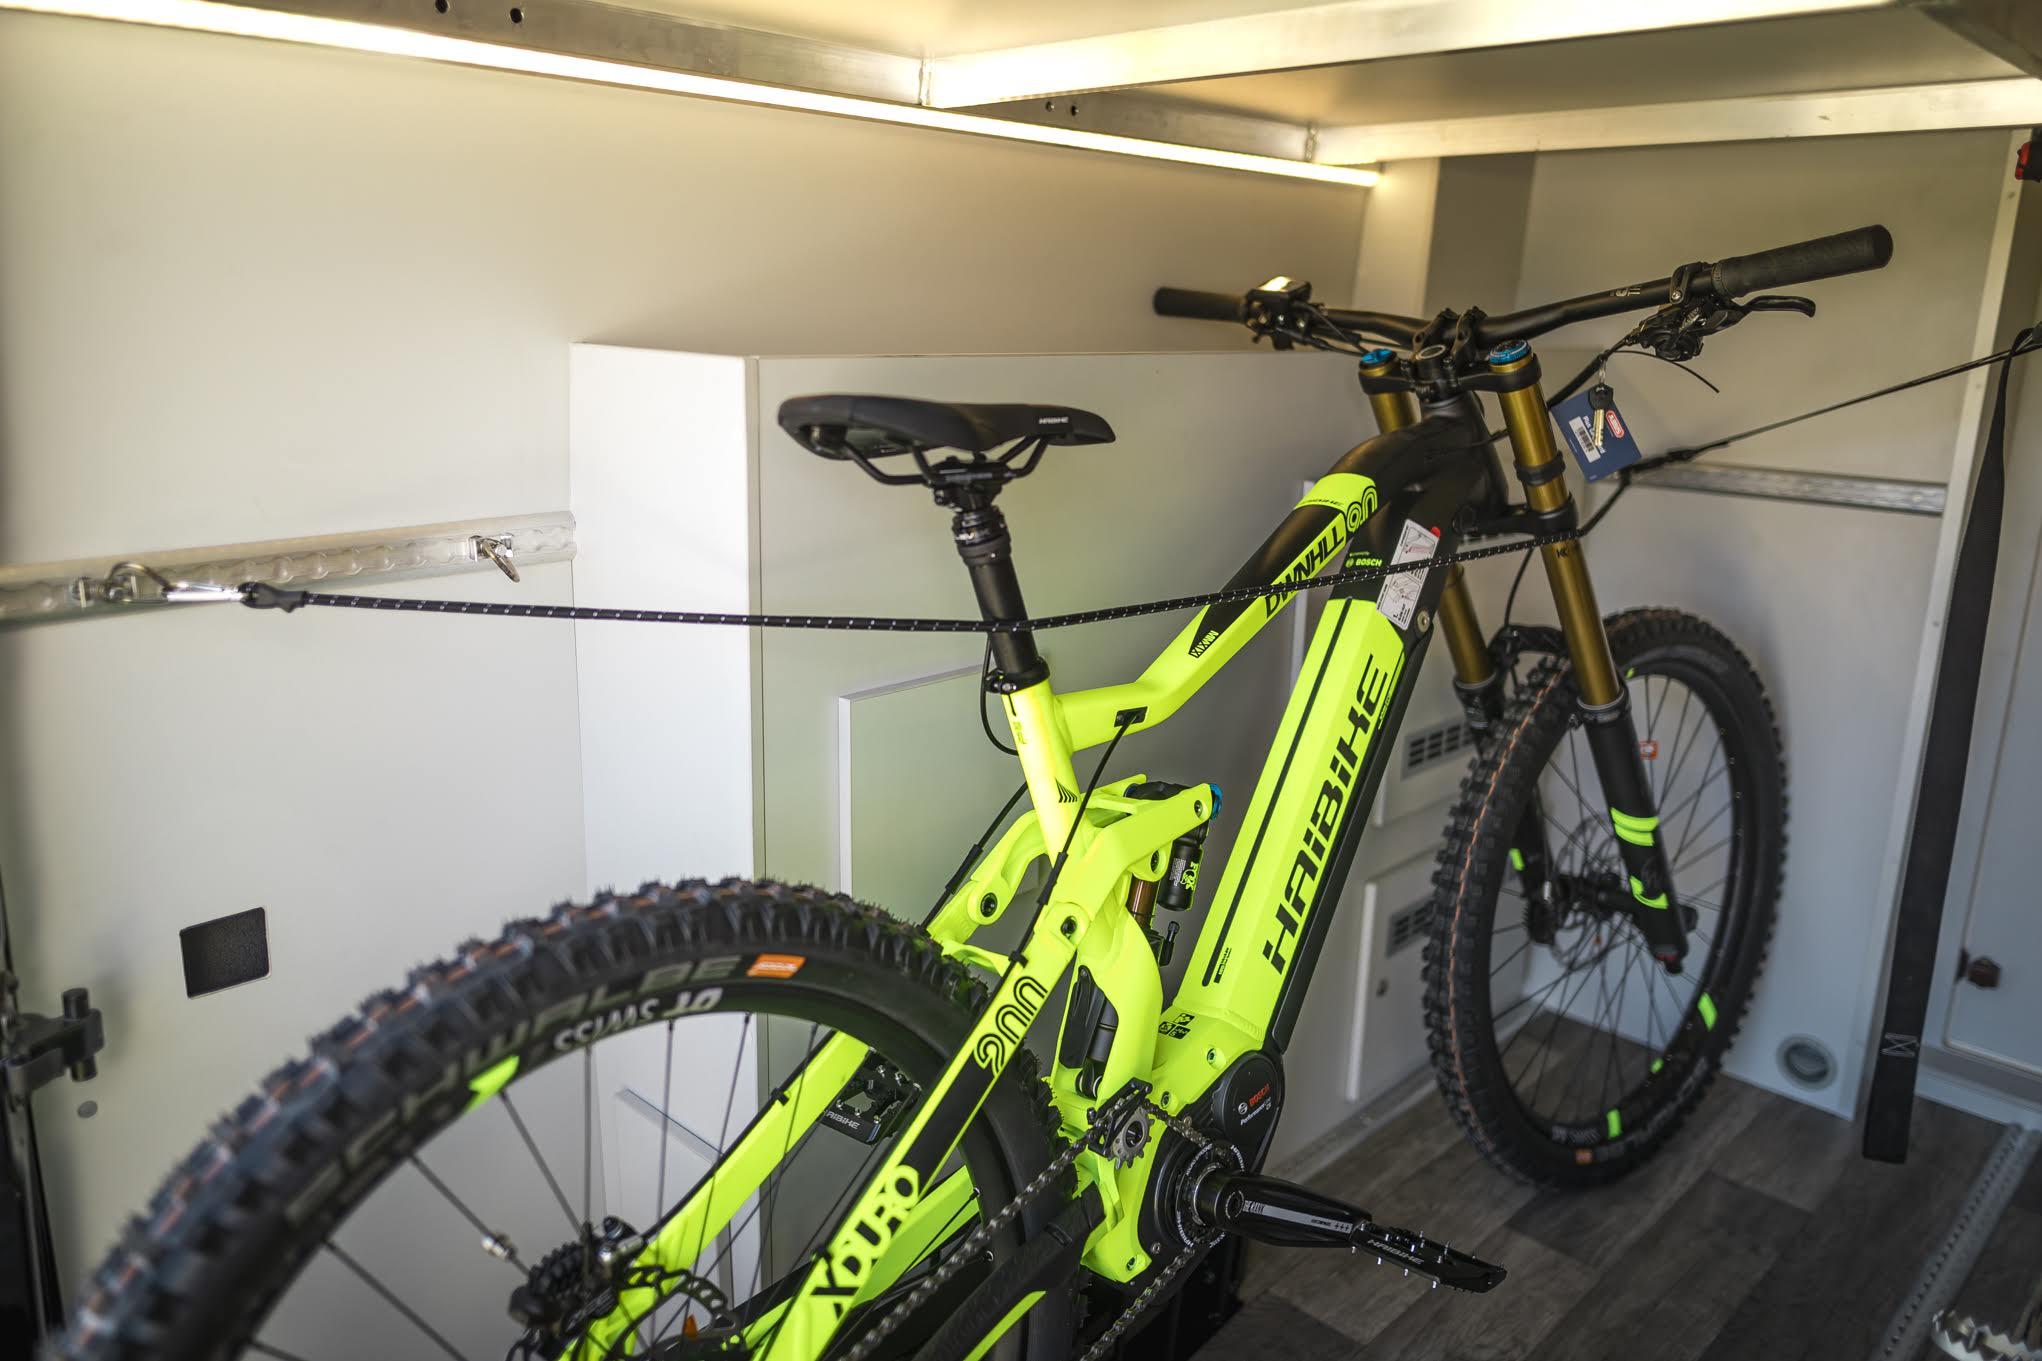 VW Crafter Compact E-Bike Garage